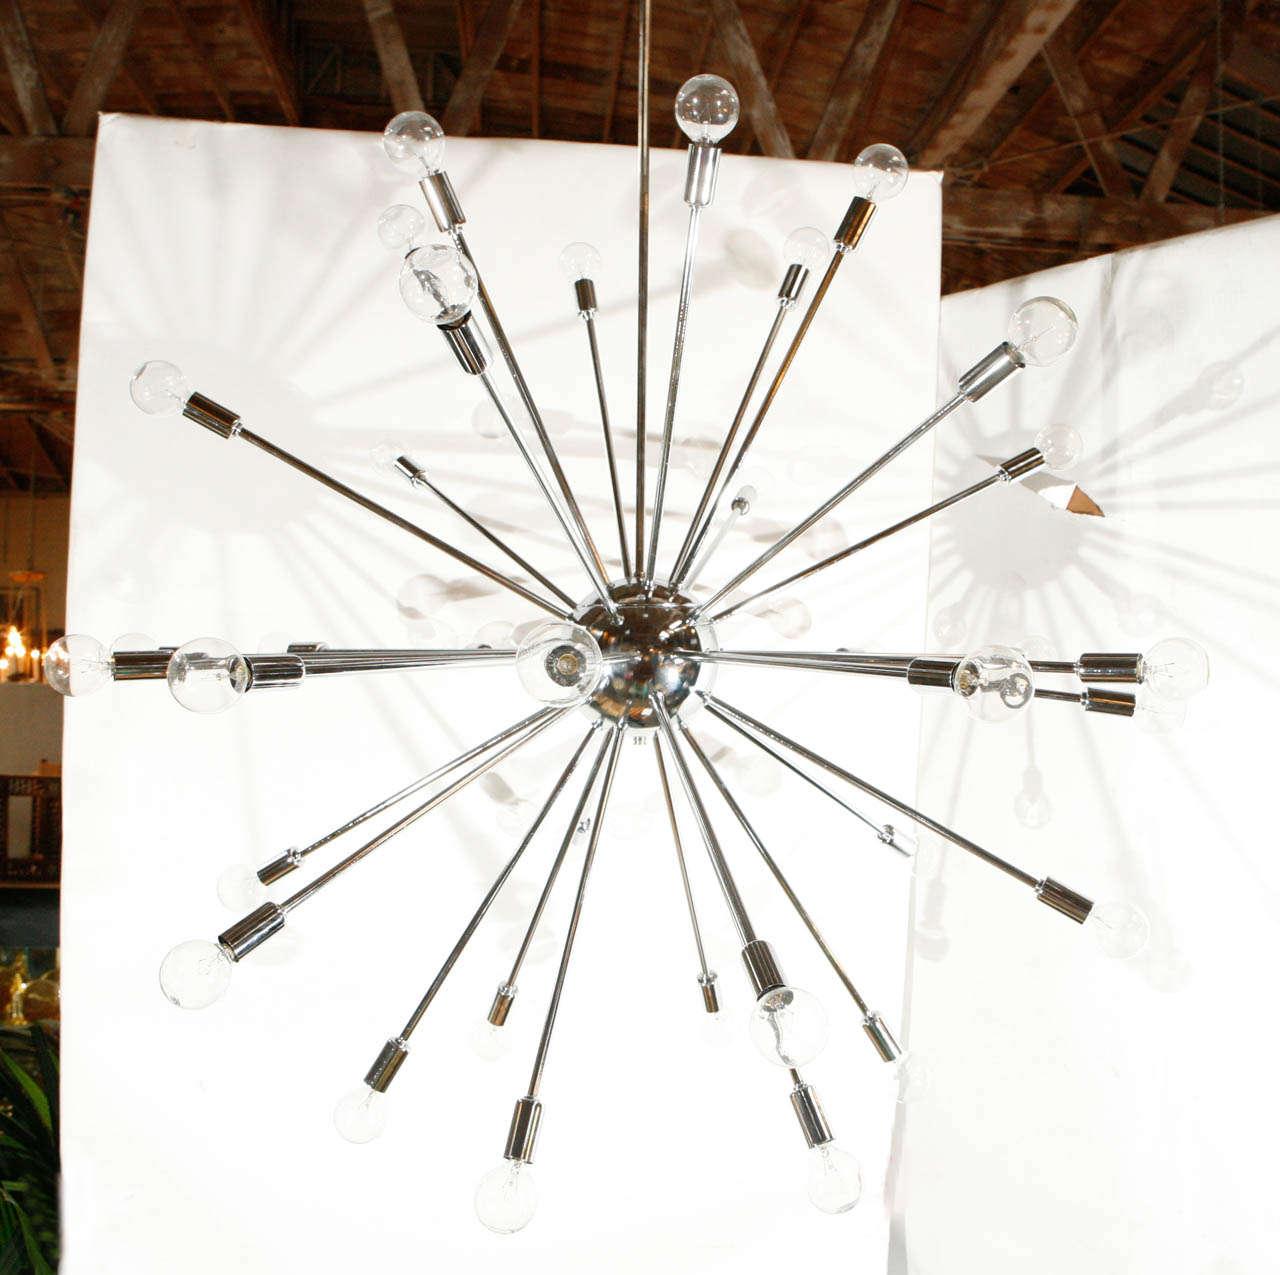 A spectacular thirty-six-light Sputnik chandelier. Chandelier is 36